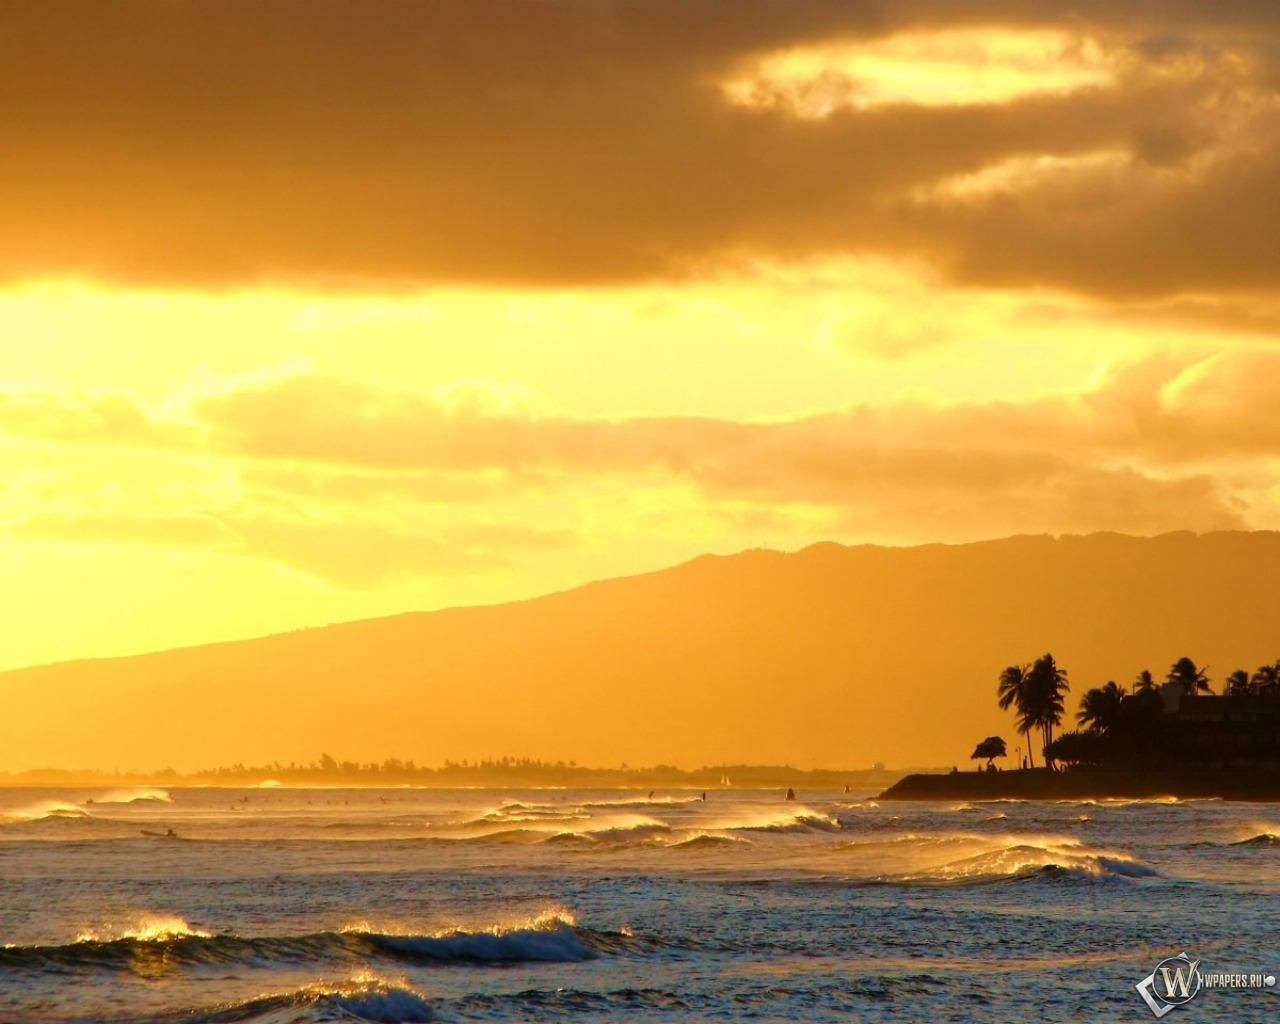 Sunset 1280x1024